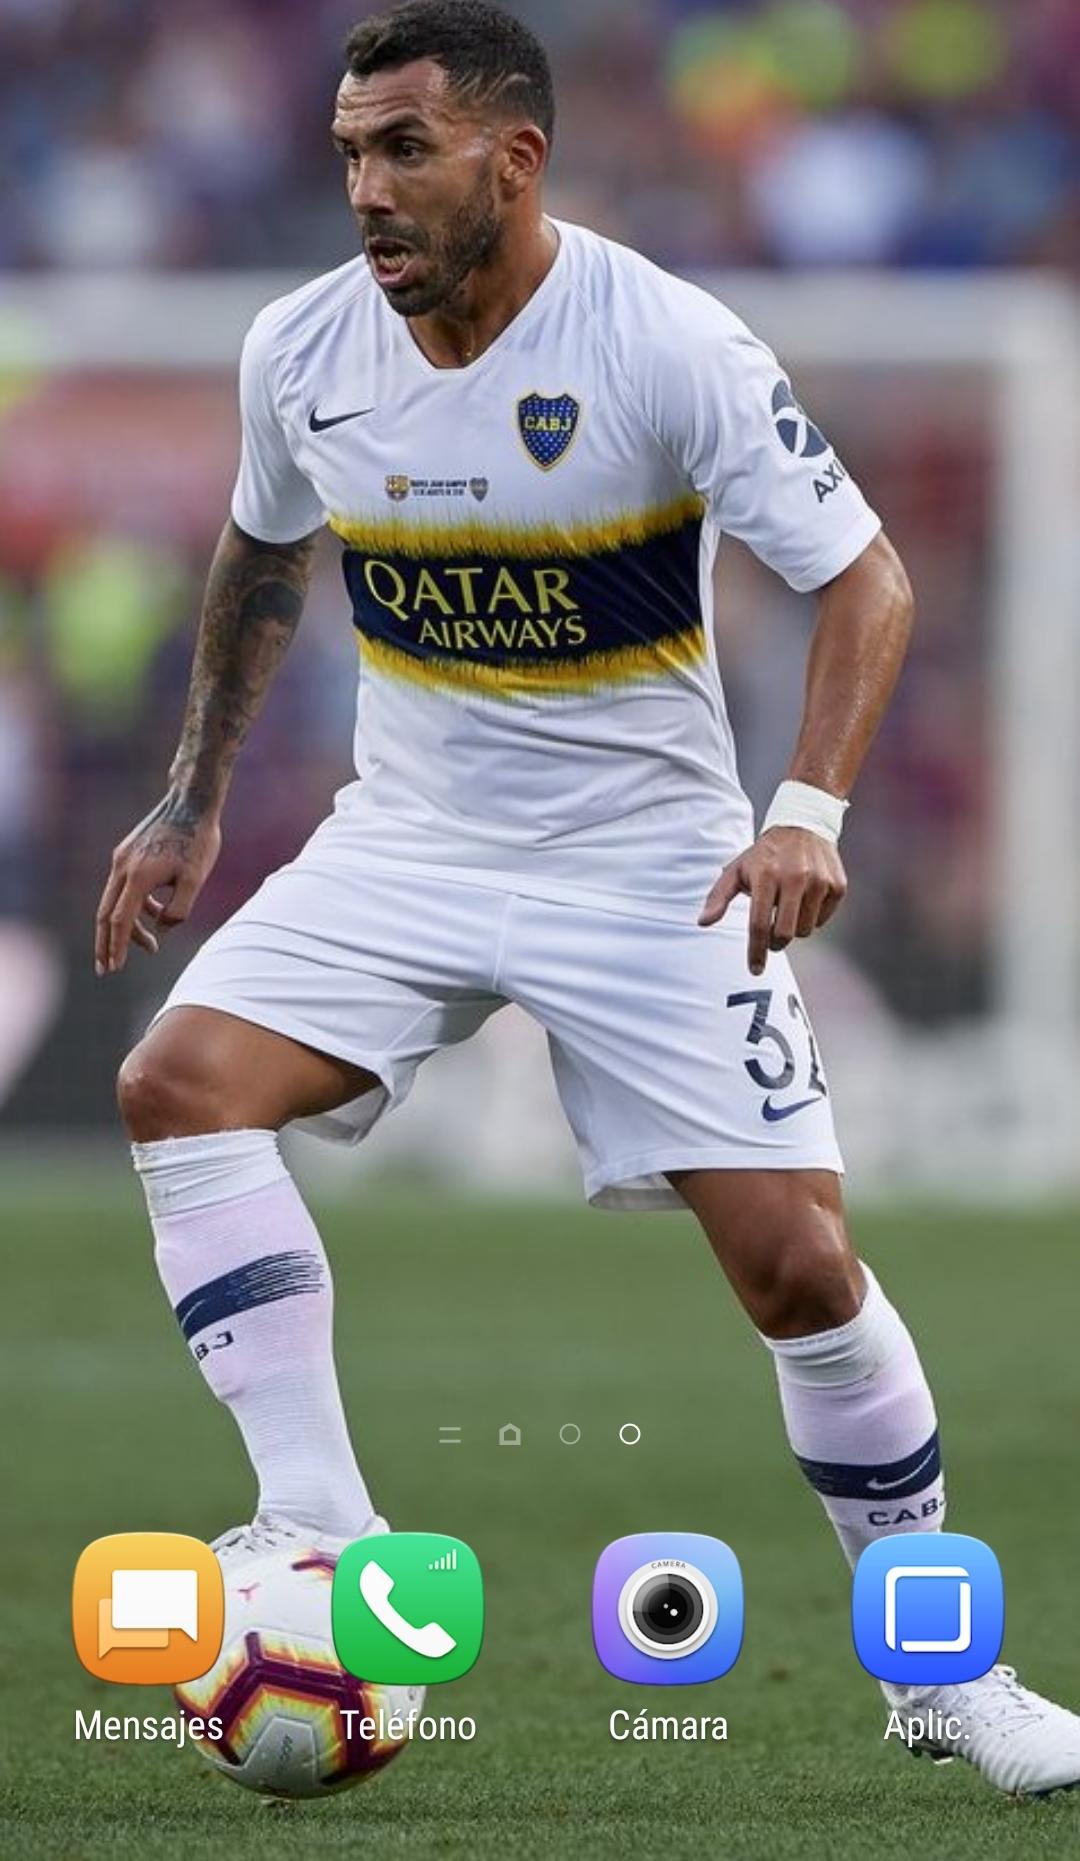 Boca Juniors - Fondos HD